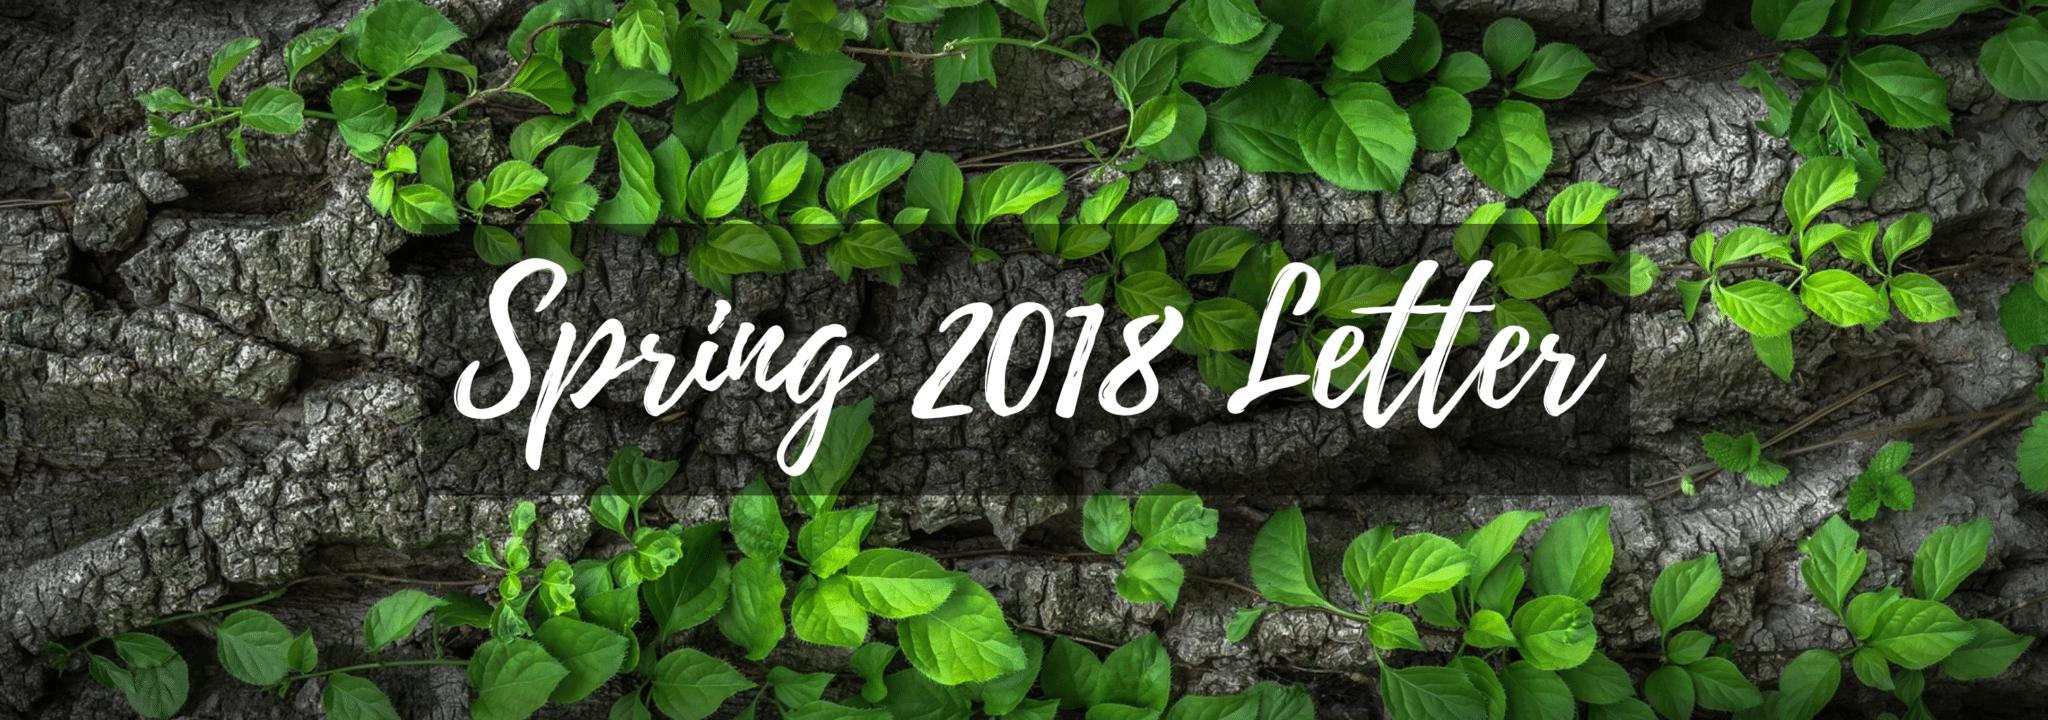 Spring 2018 Letter